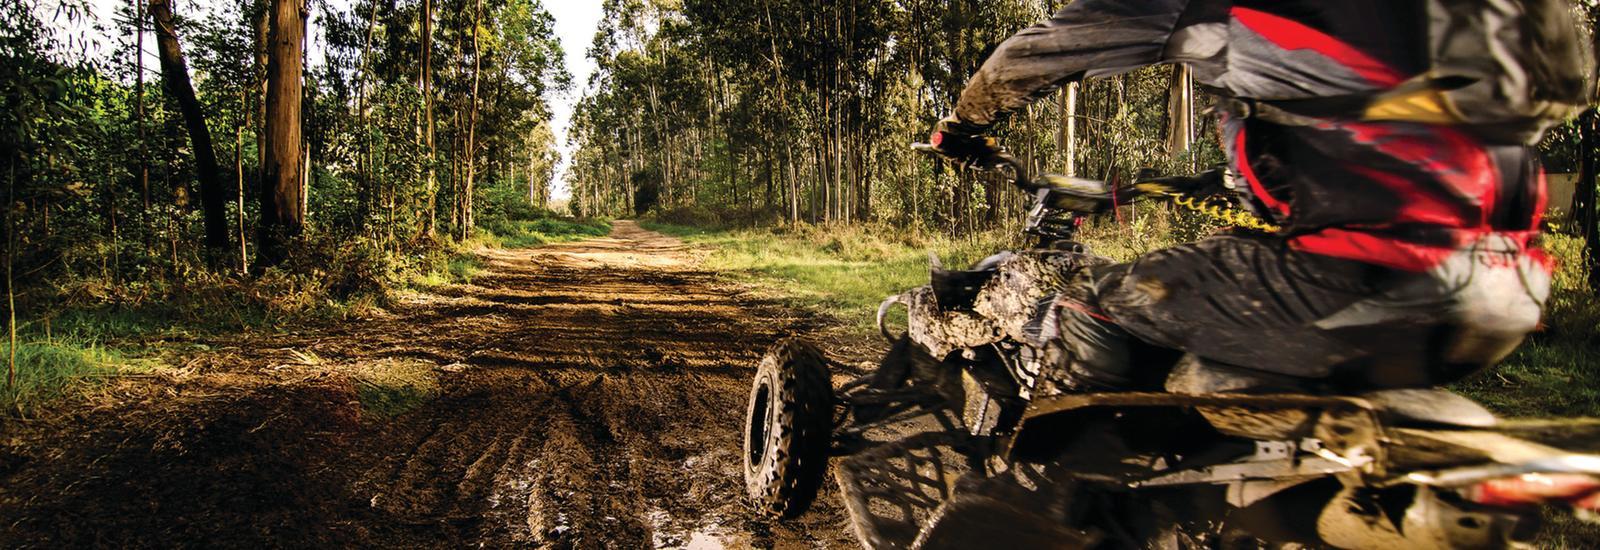 Florida Tracks and Trails